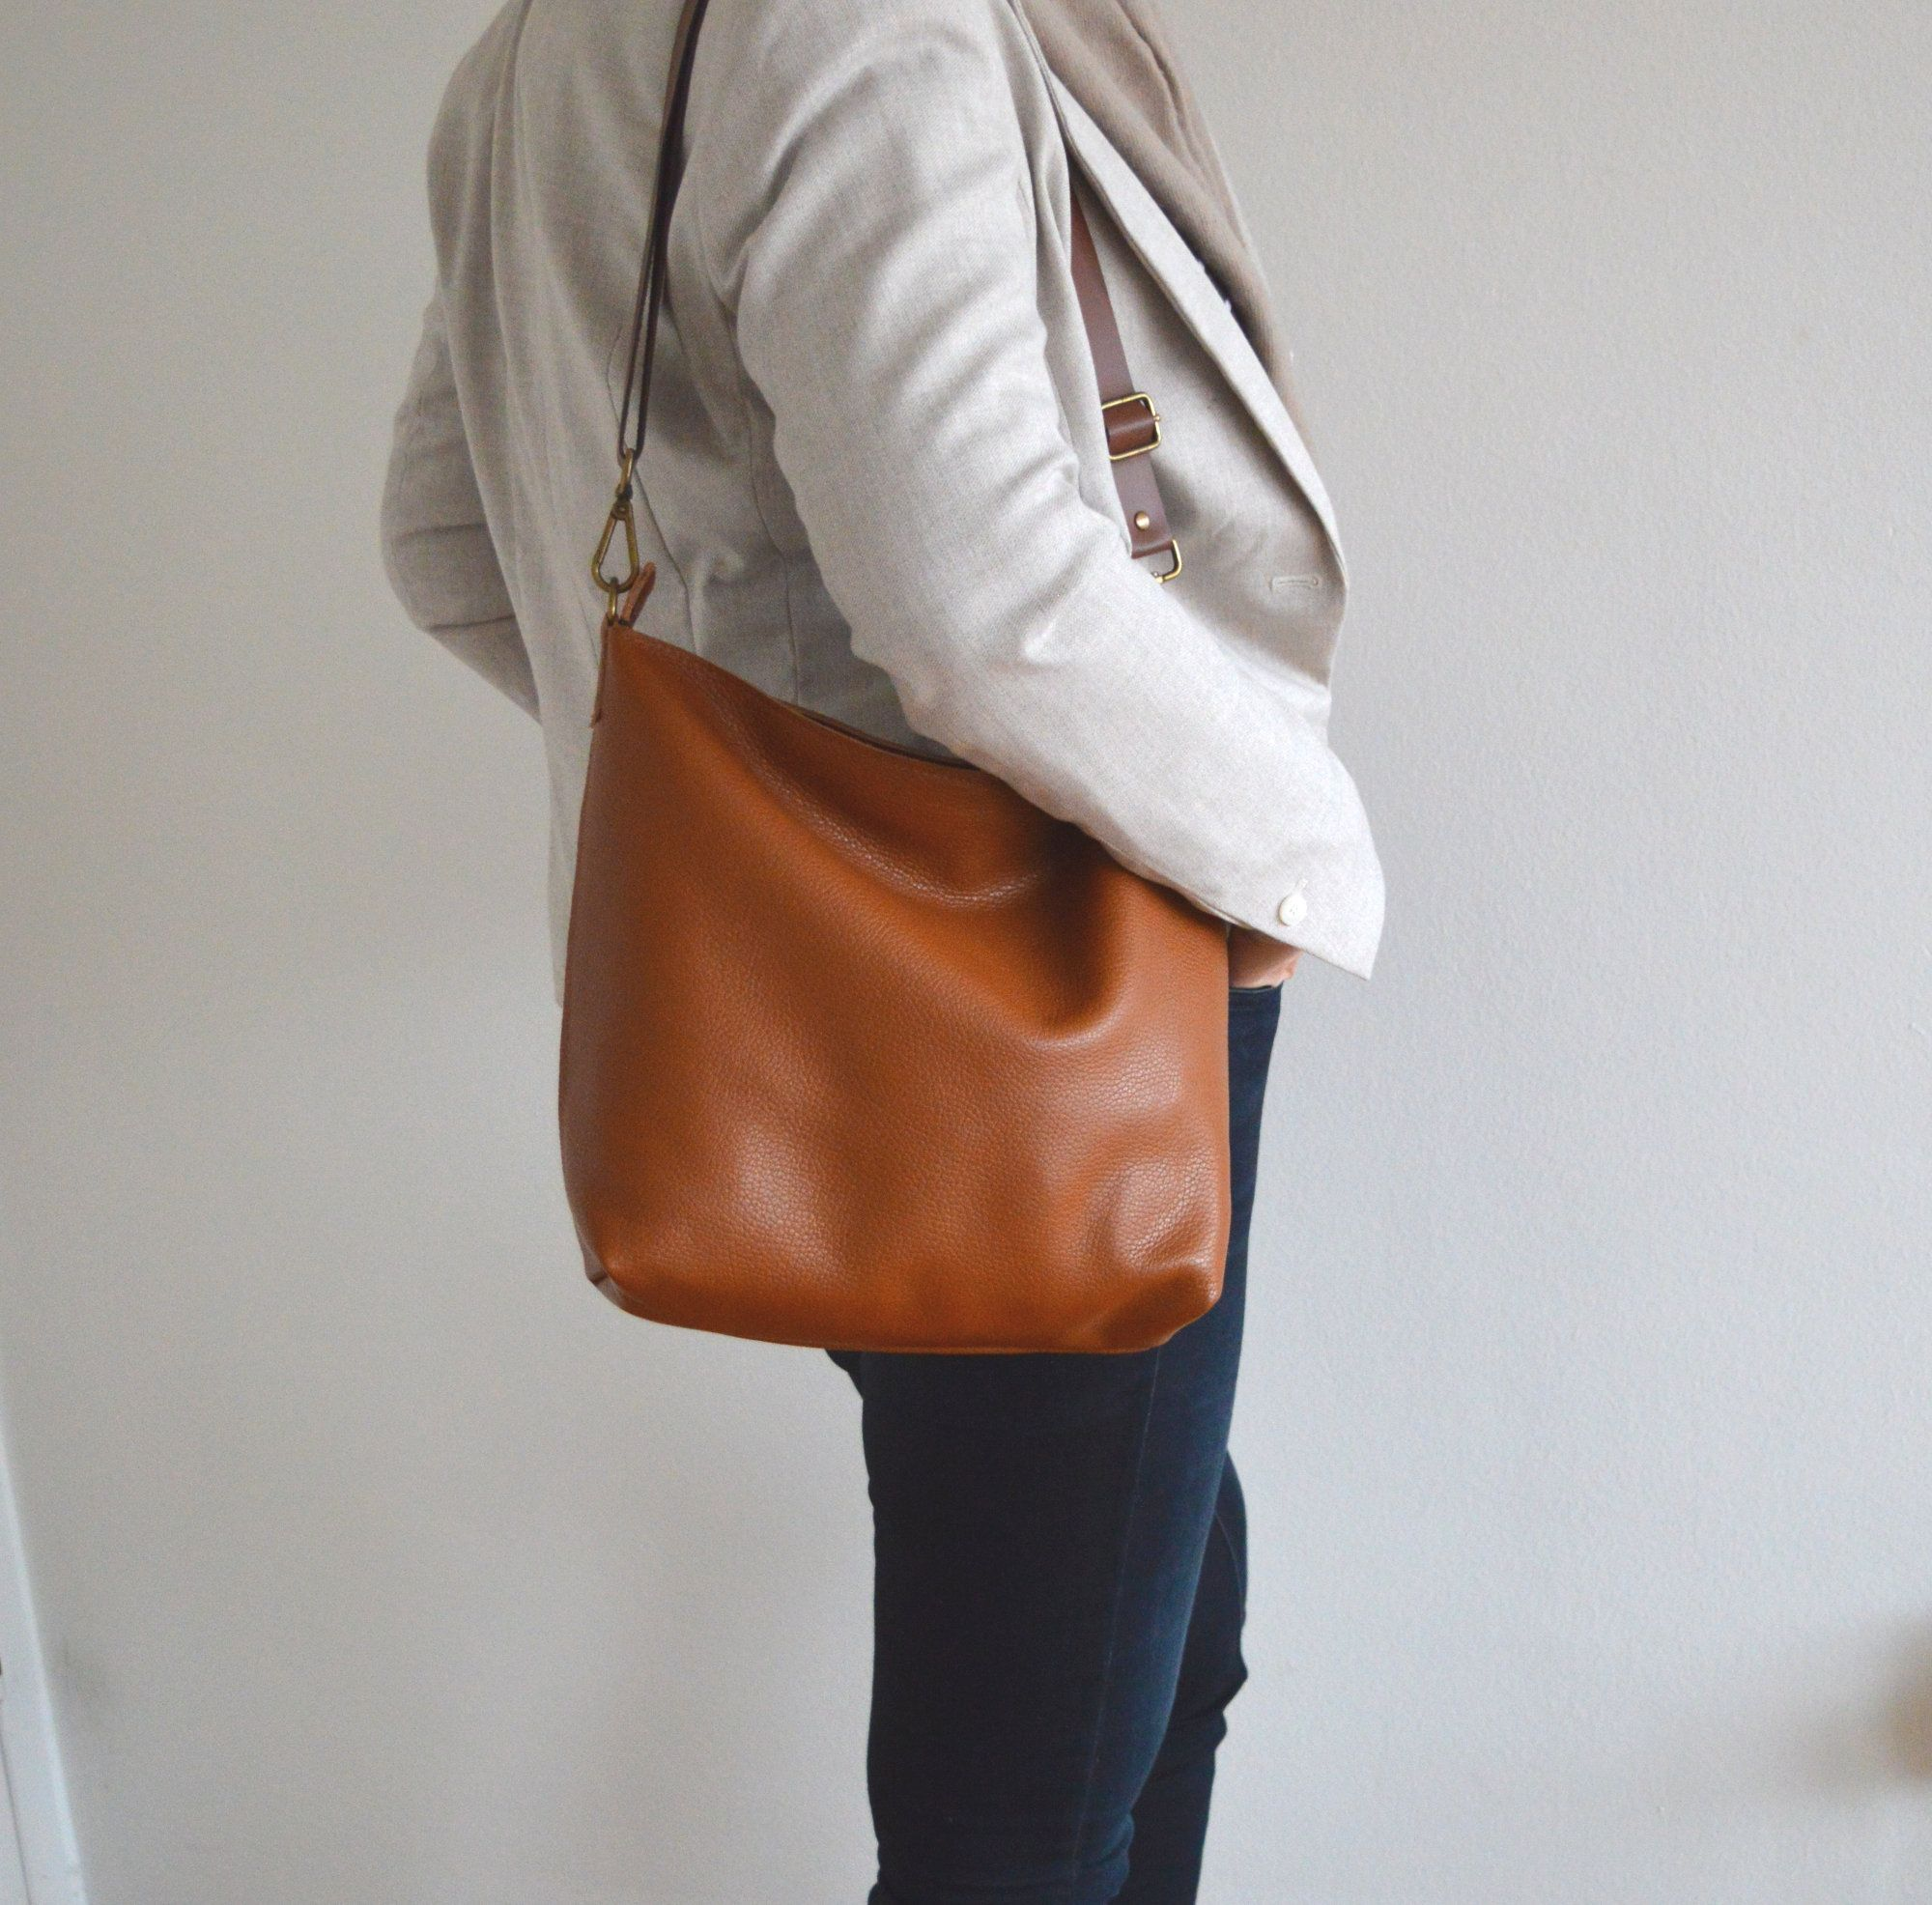 Leather Cross Body Bag Handmade Genuine Leather Purse Gift for Her Boho Bag Tan Leather Leather Sling Bag Zipper Bag Handbag